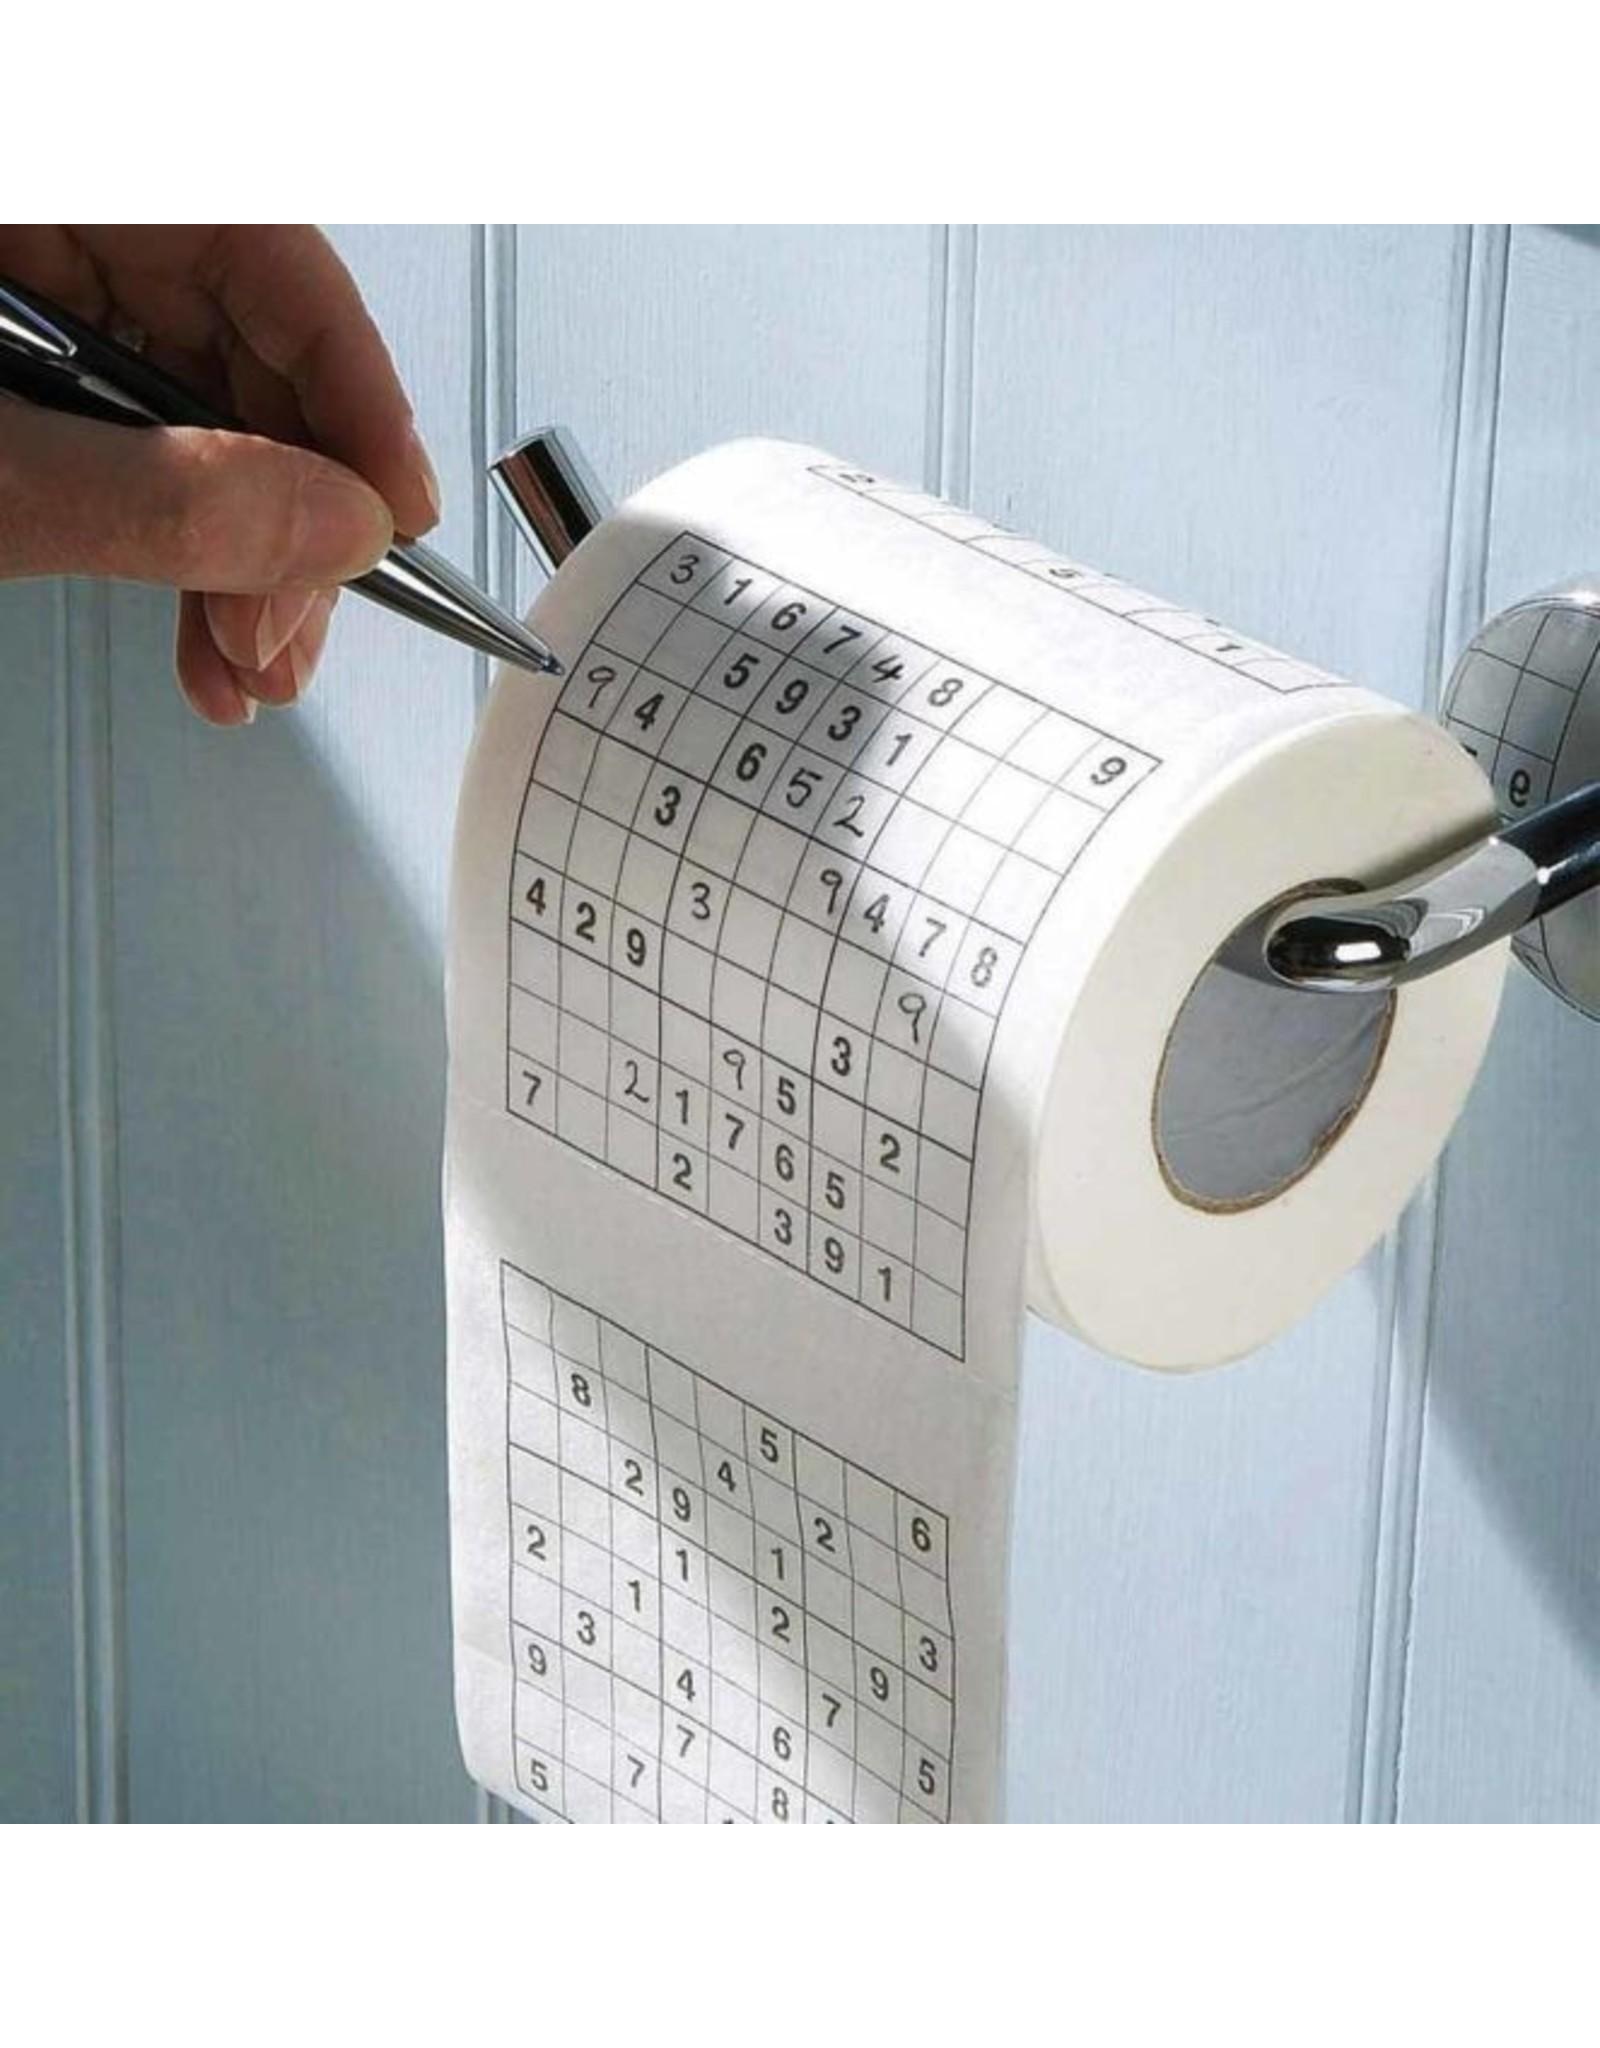 Legami toilet roll - sudoku